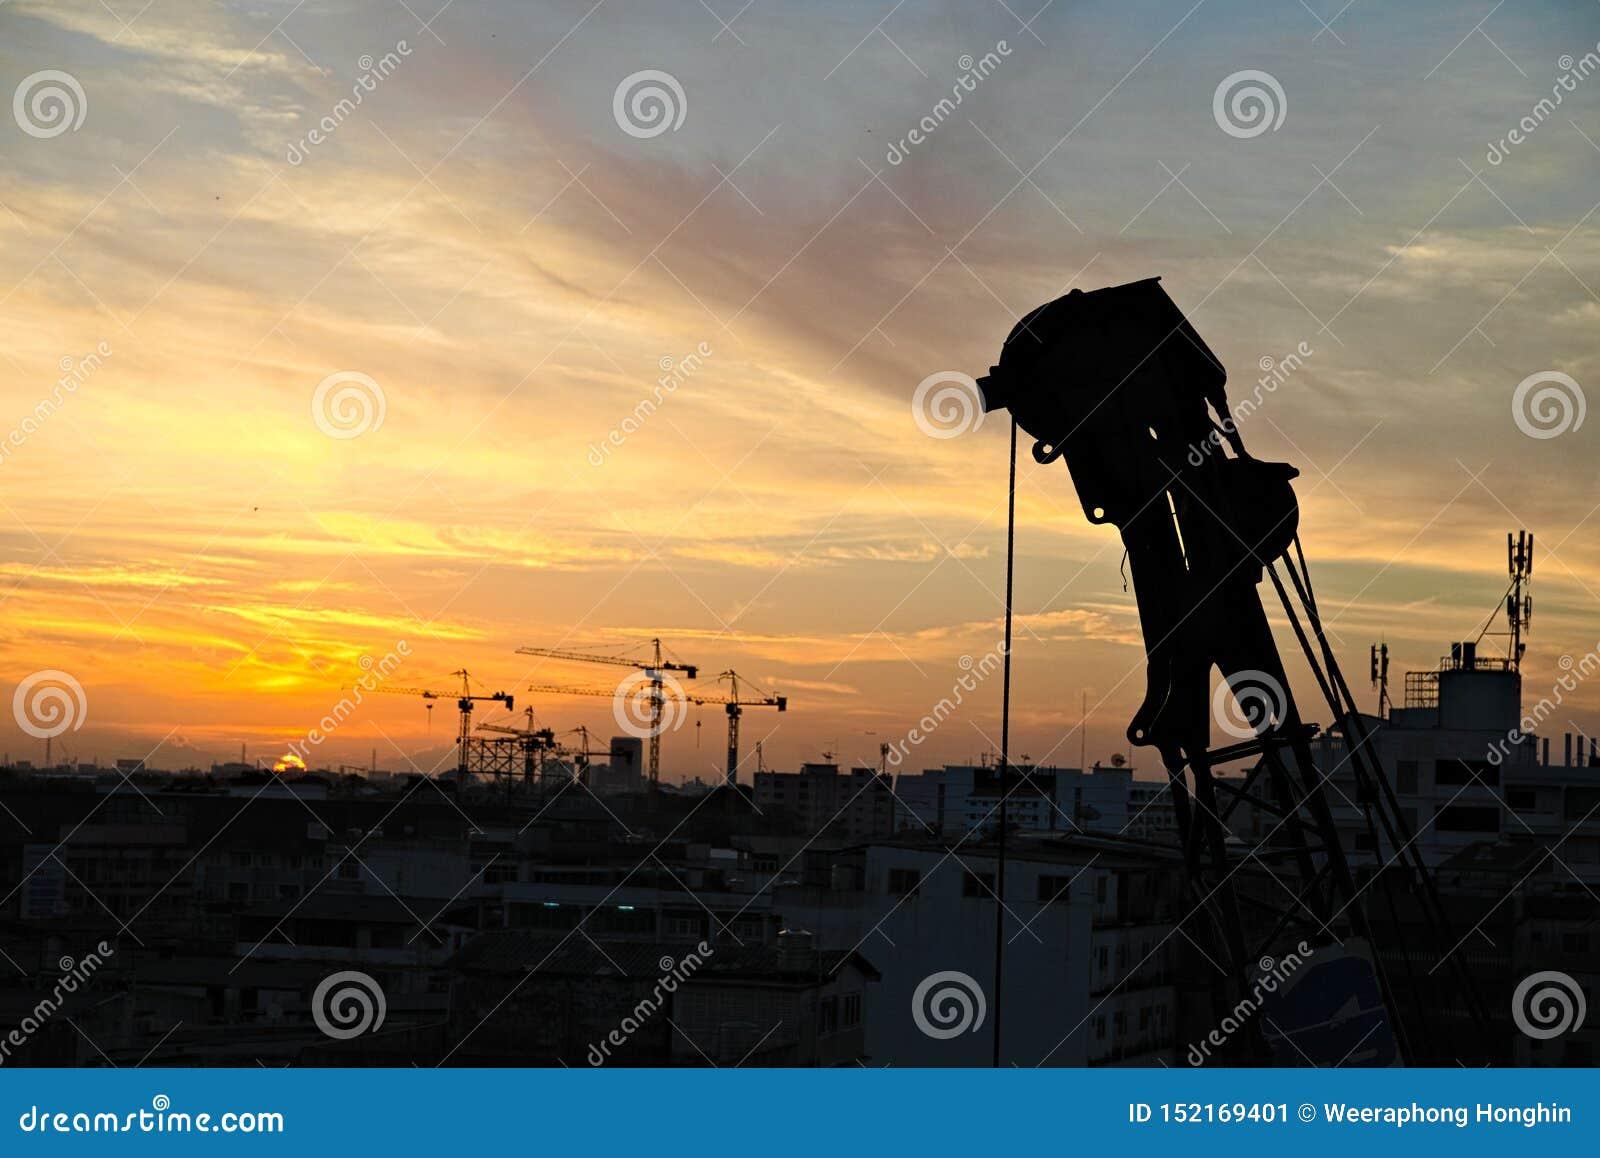 Кран готовый для работы после восхода солнца